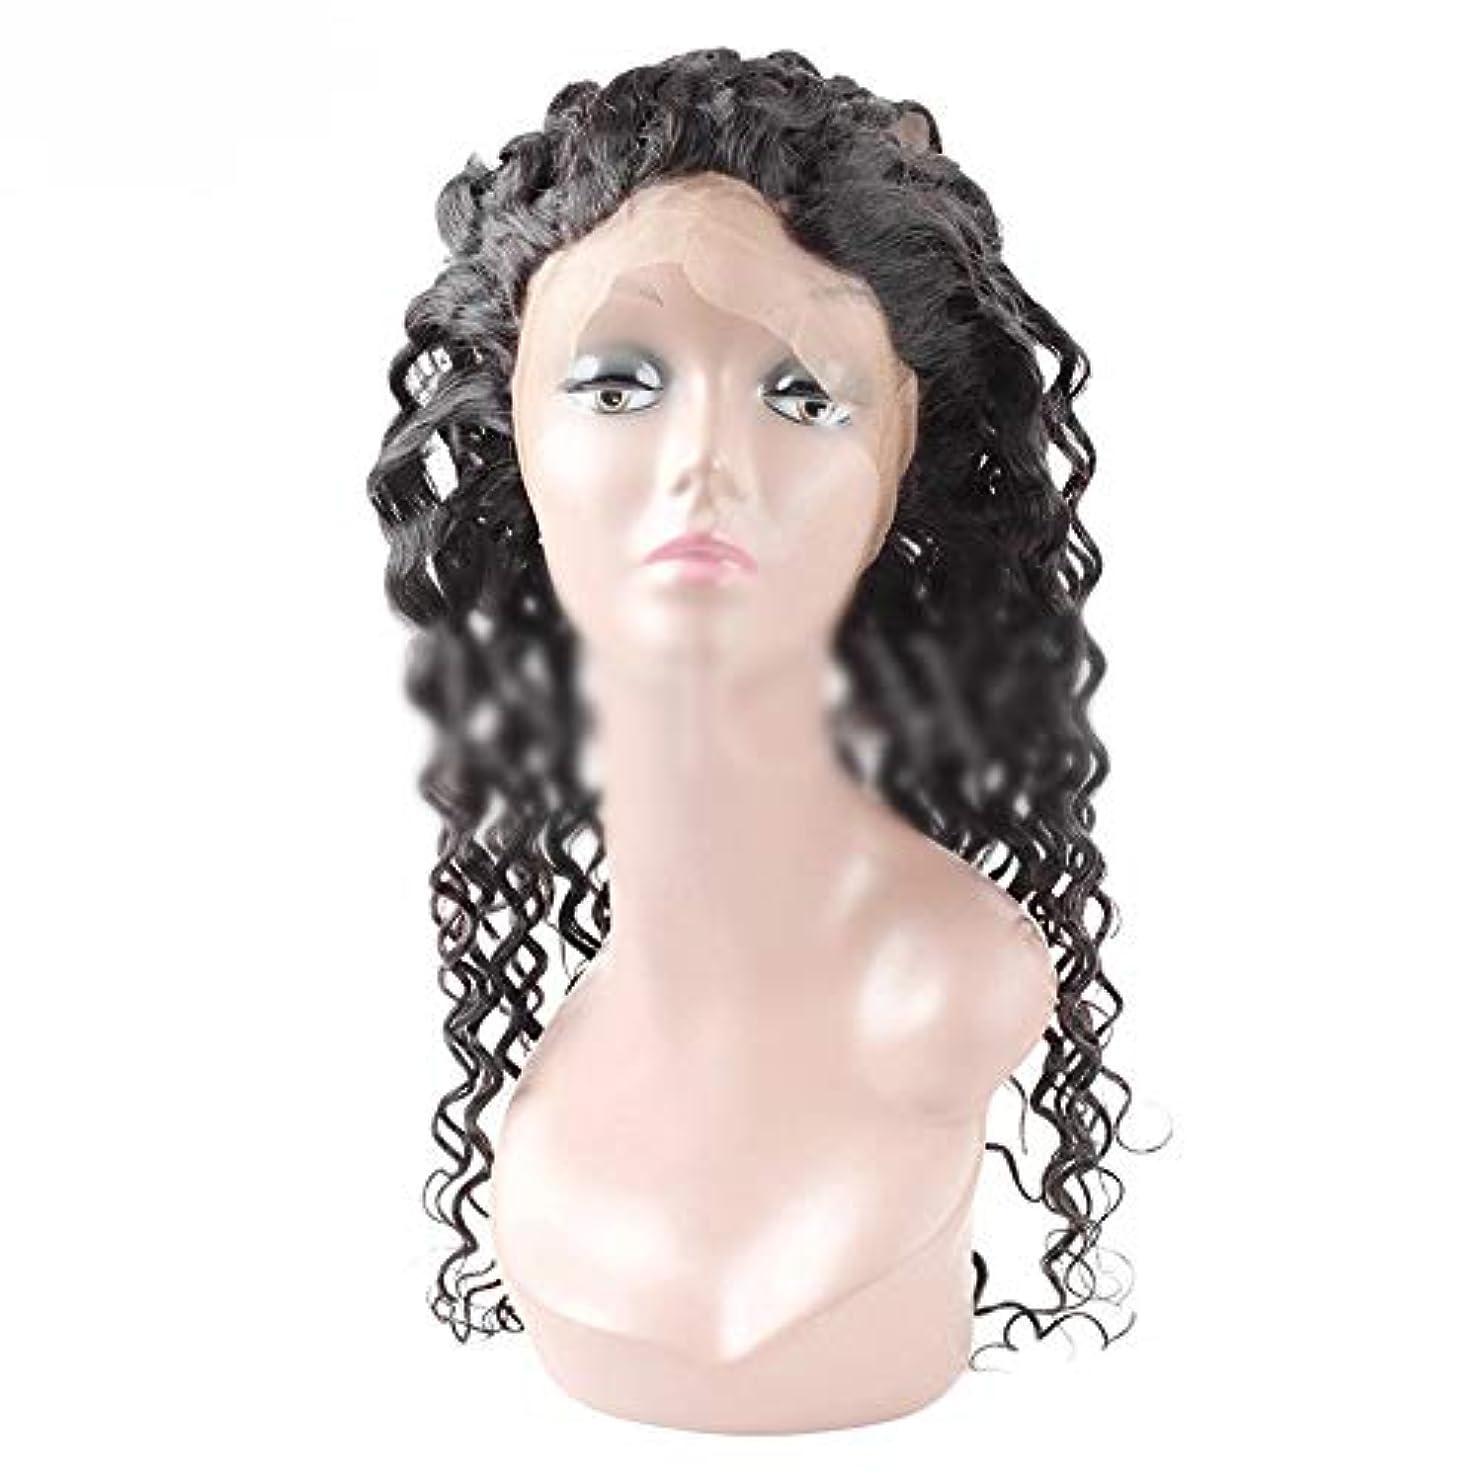 HOHYLLYA 360レース前頭葉9Aブラジル人間の髪水波レース前頭閉鎖ナチュラルカラー用女性合成ヘアレースかつらロールプレイングかつらロングとショート女性自然 (色 : ブラック, サイズ : 14 inch)